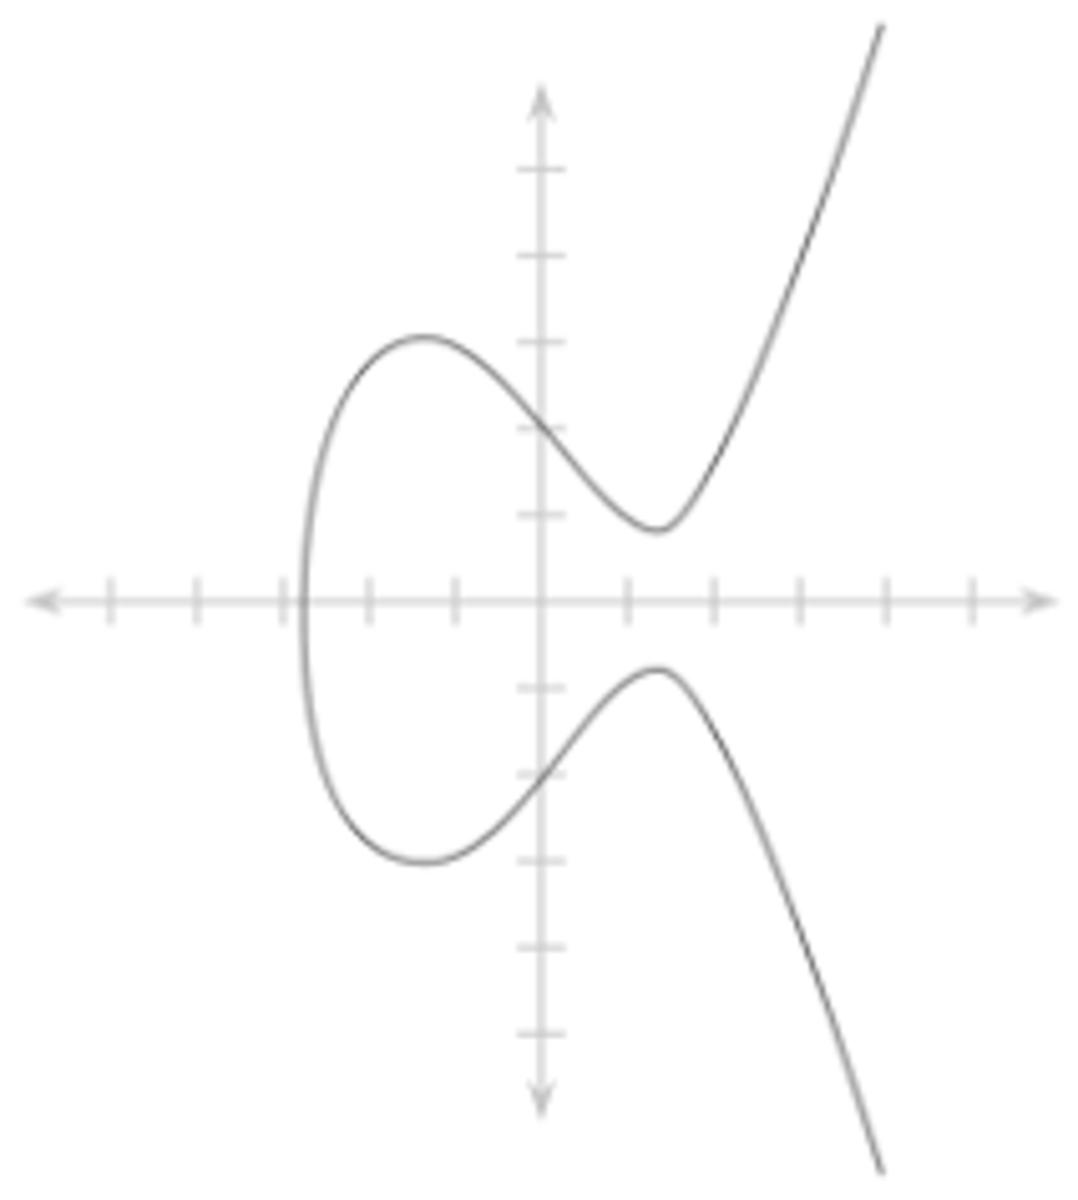 225px-Elliptic_curve_simple